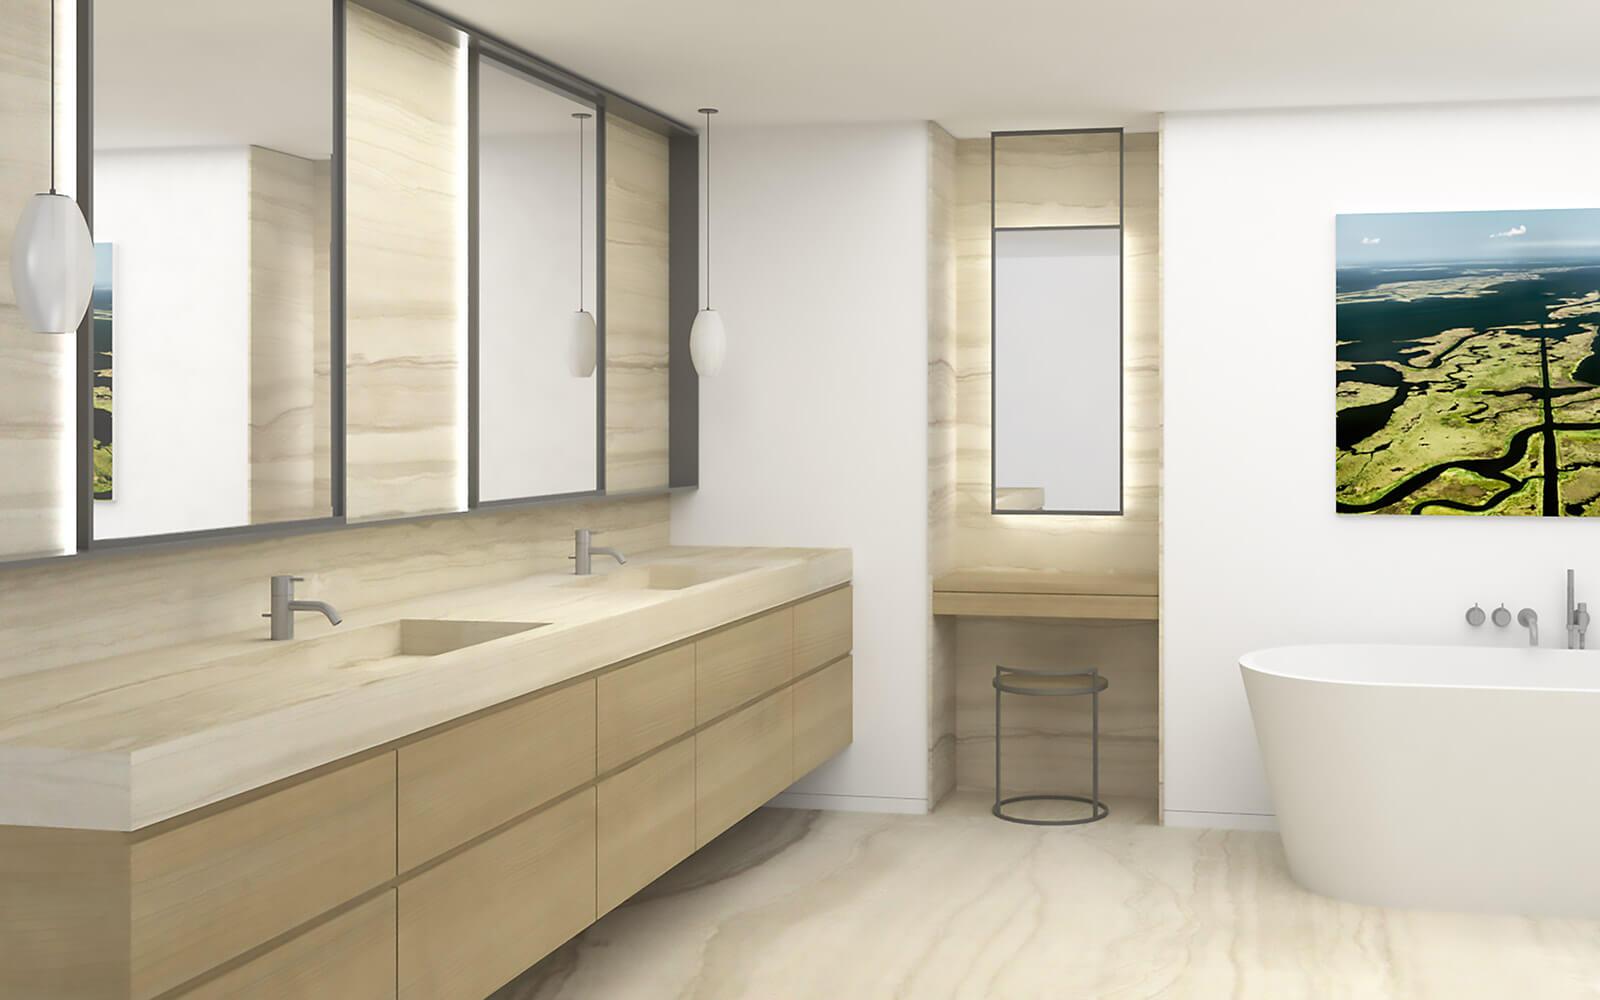 studio vara residential soma loft steel mirror frame travertine